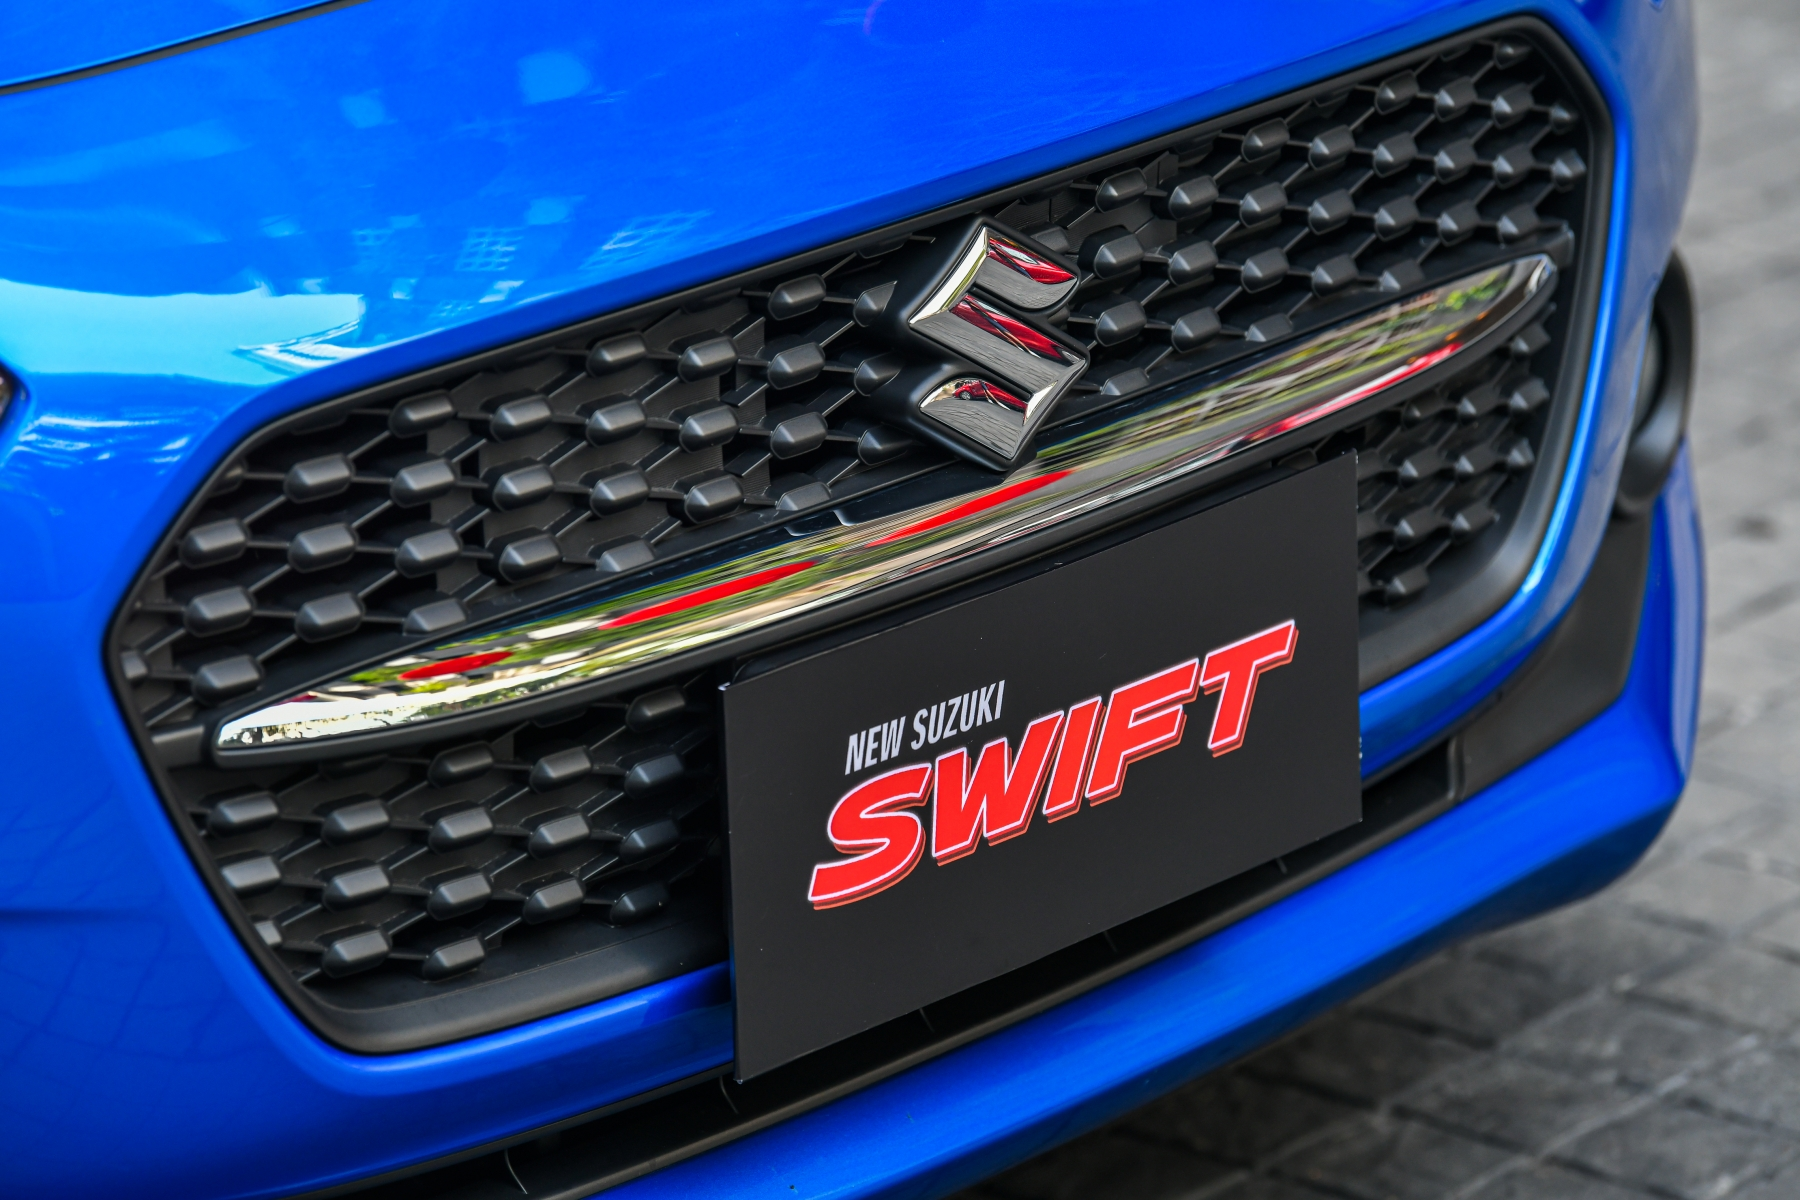 SWIFT exterior_0004